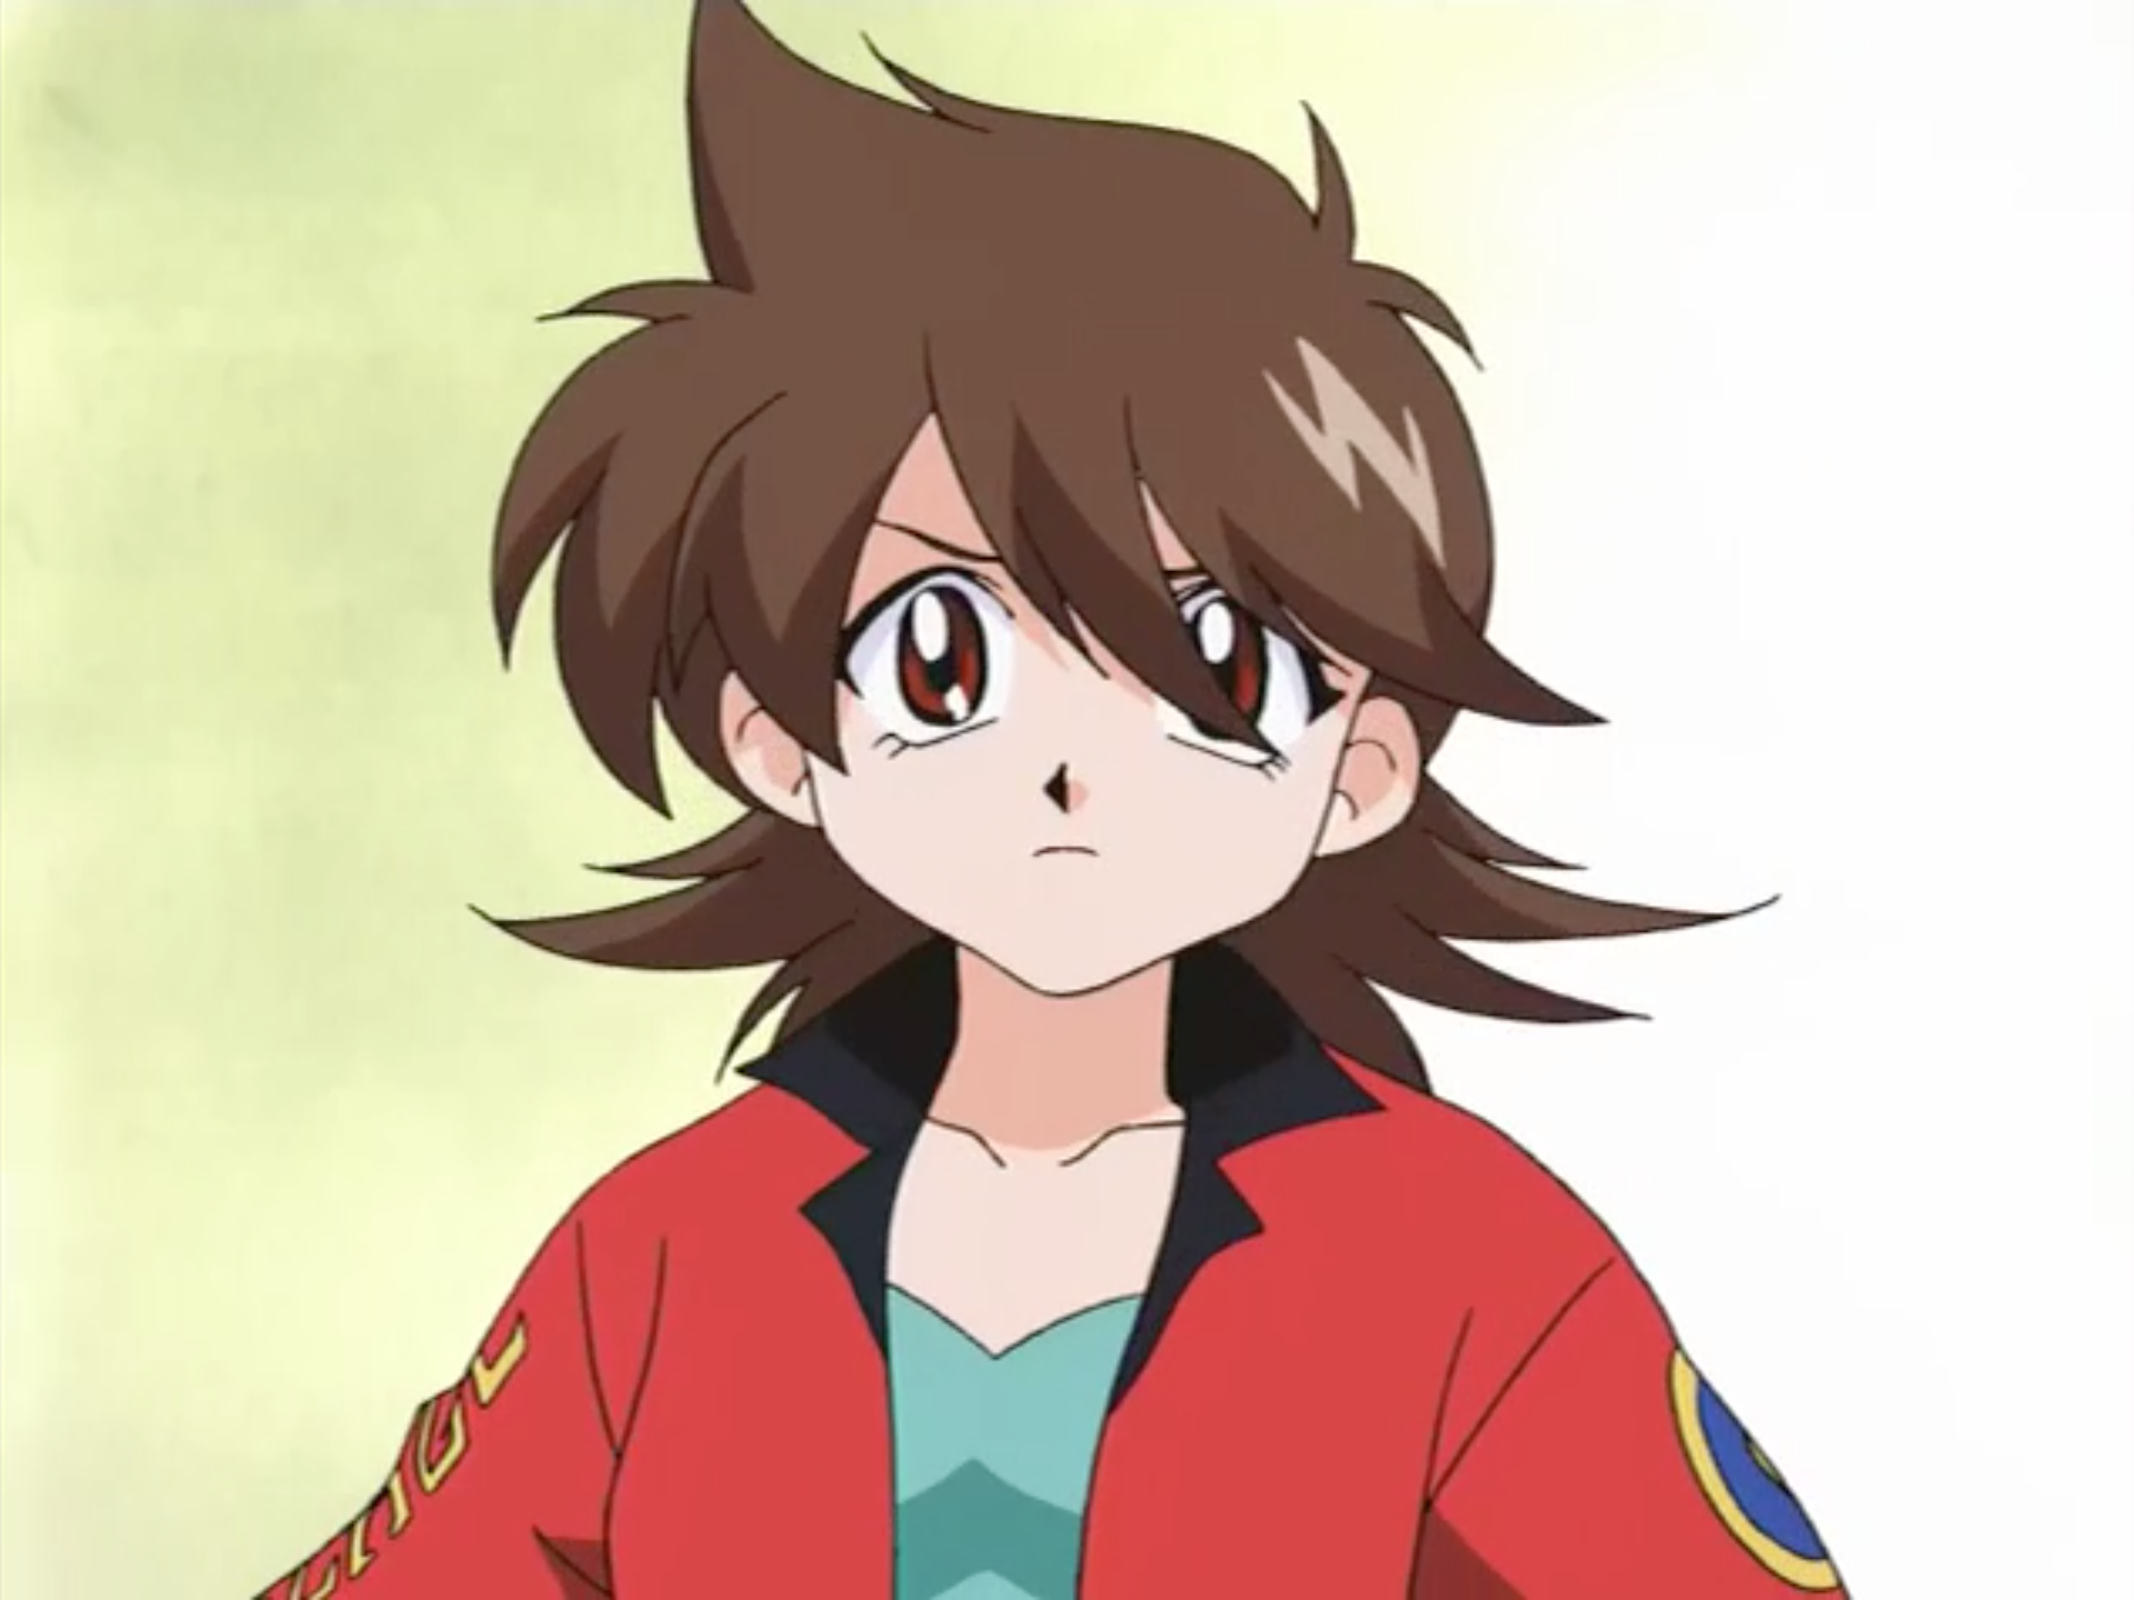 Hilary Tachibana